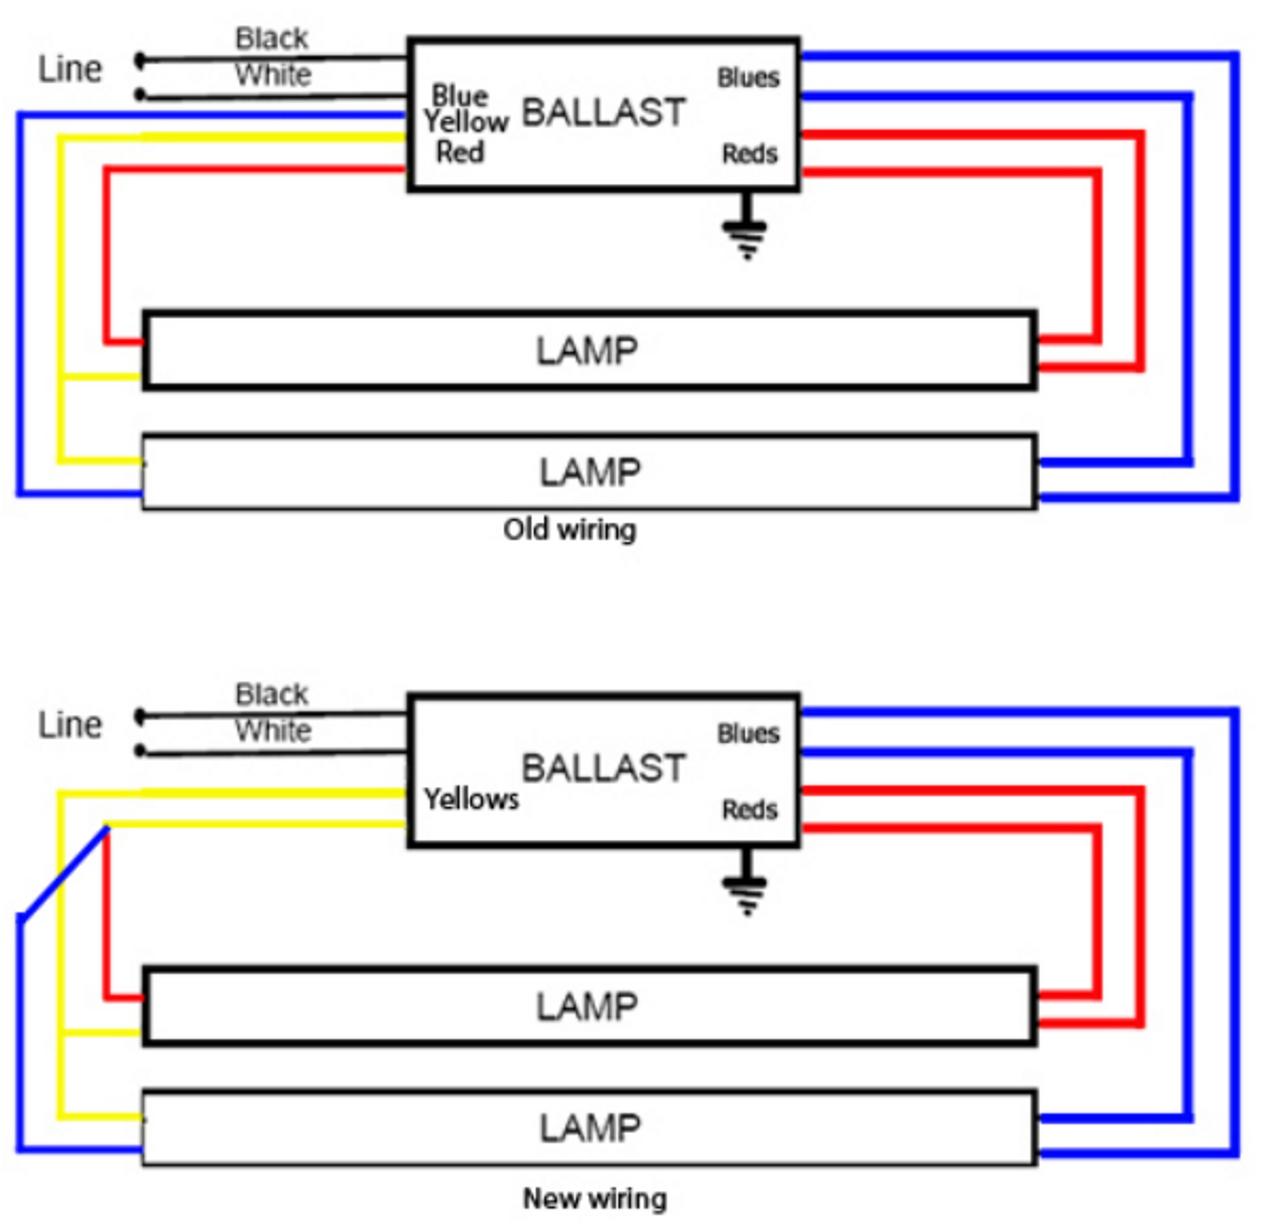 t12 magnetic ballast wiring diagram -  sunpark sl15t electronic replacement  ballastsunpark sl15t ballast   sunpark sl15t label   sl15t two linear tube